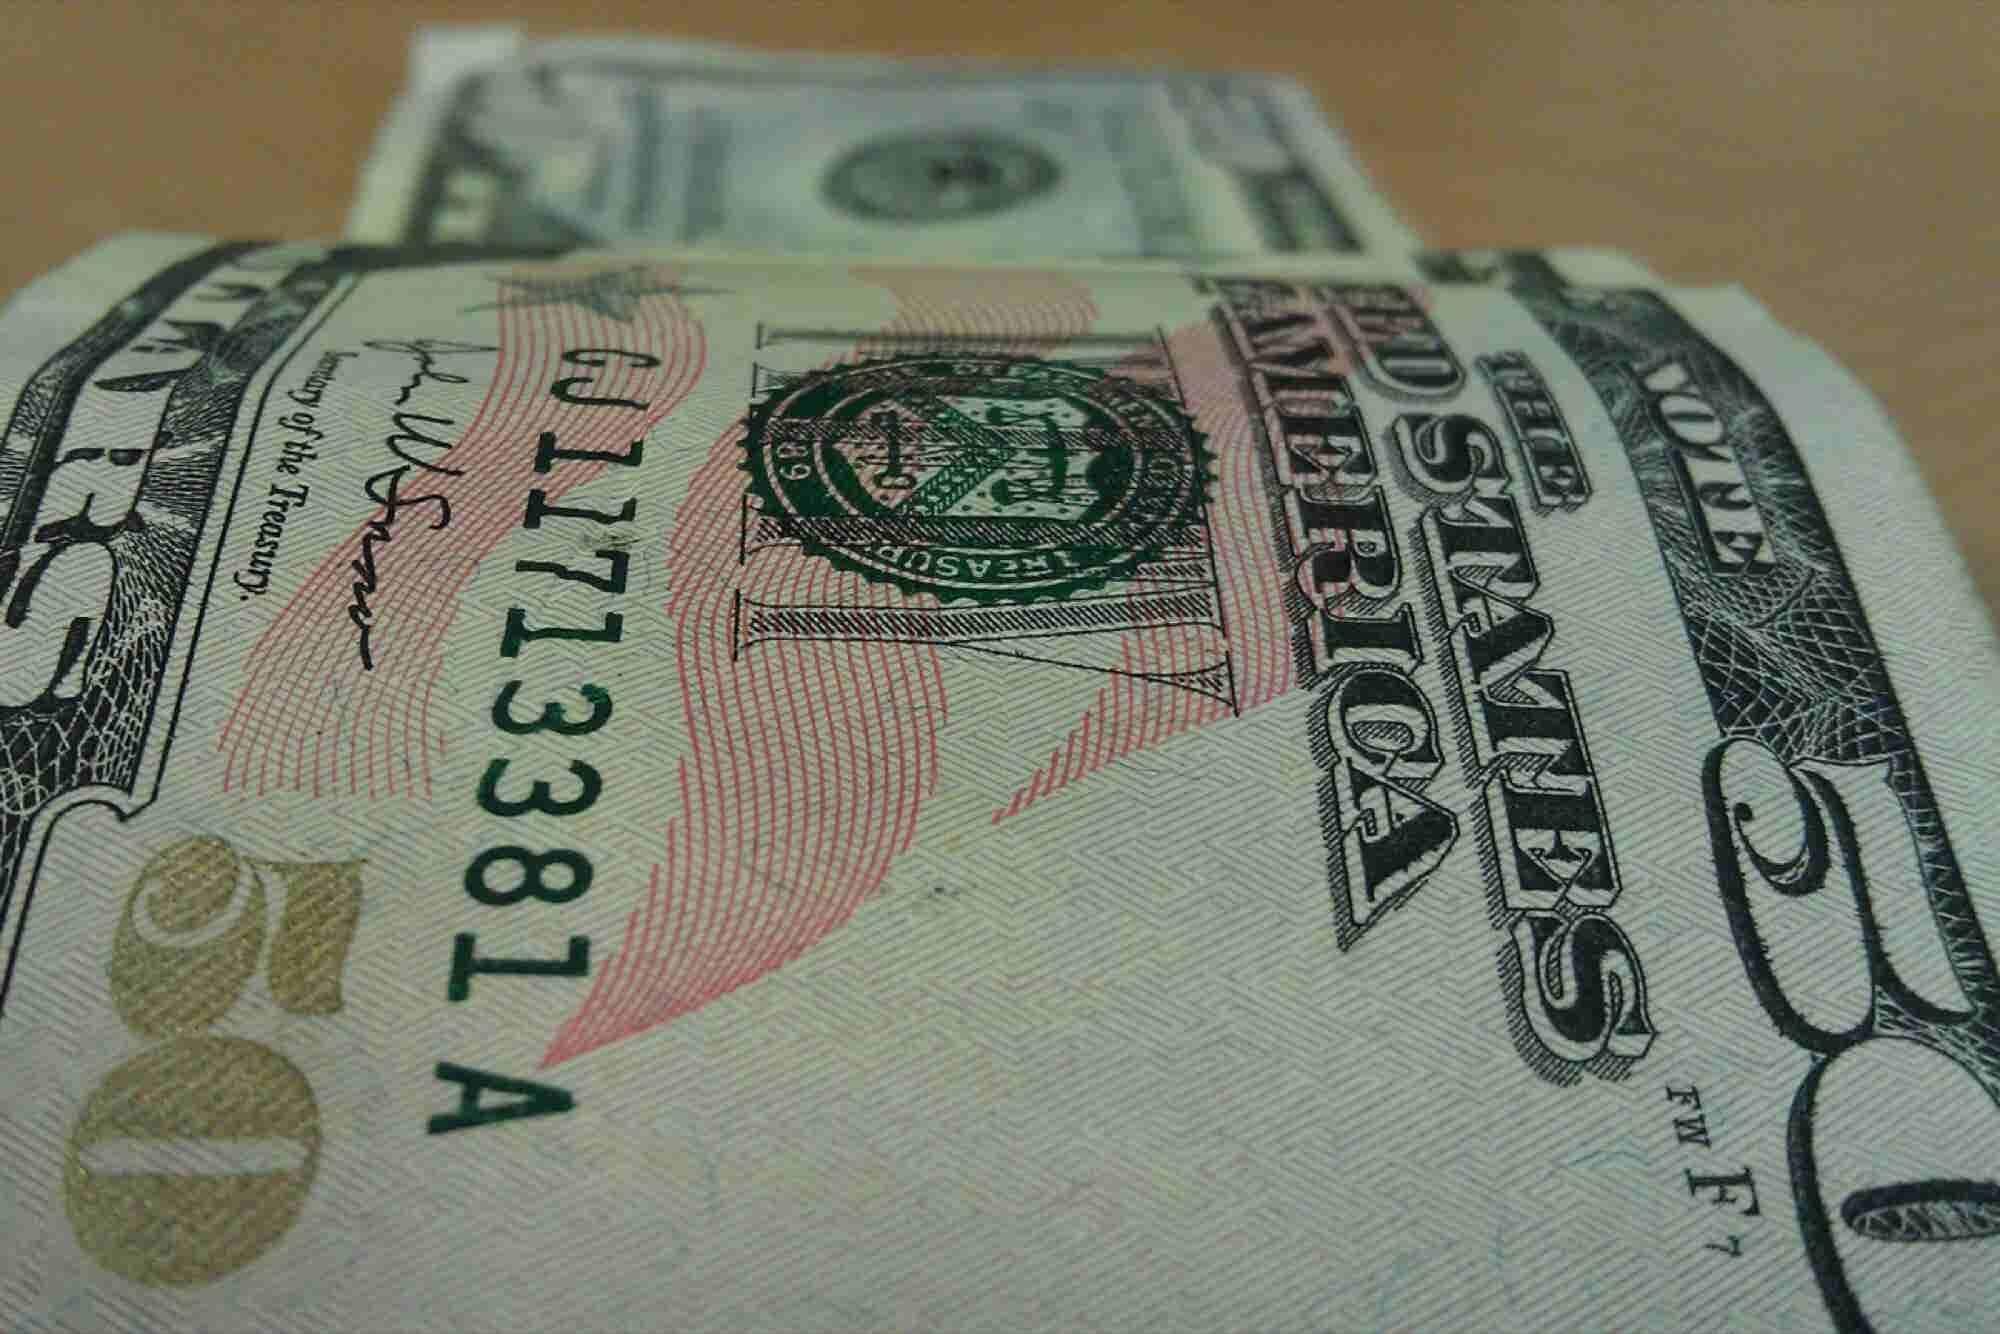 When Seeking an SBA Loan, Remember the 5 C's